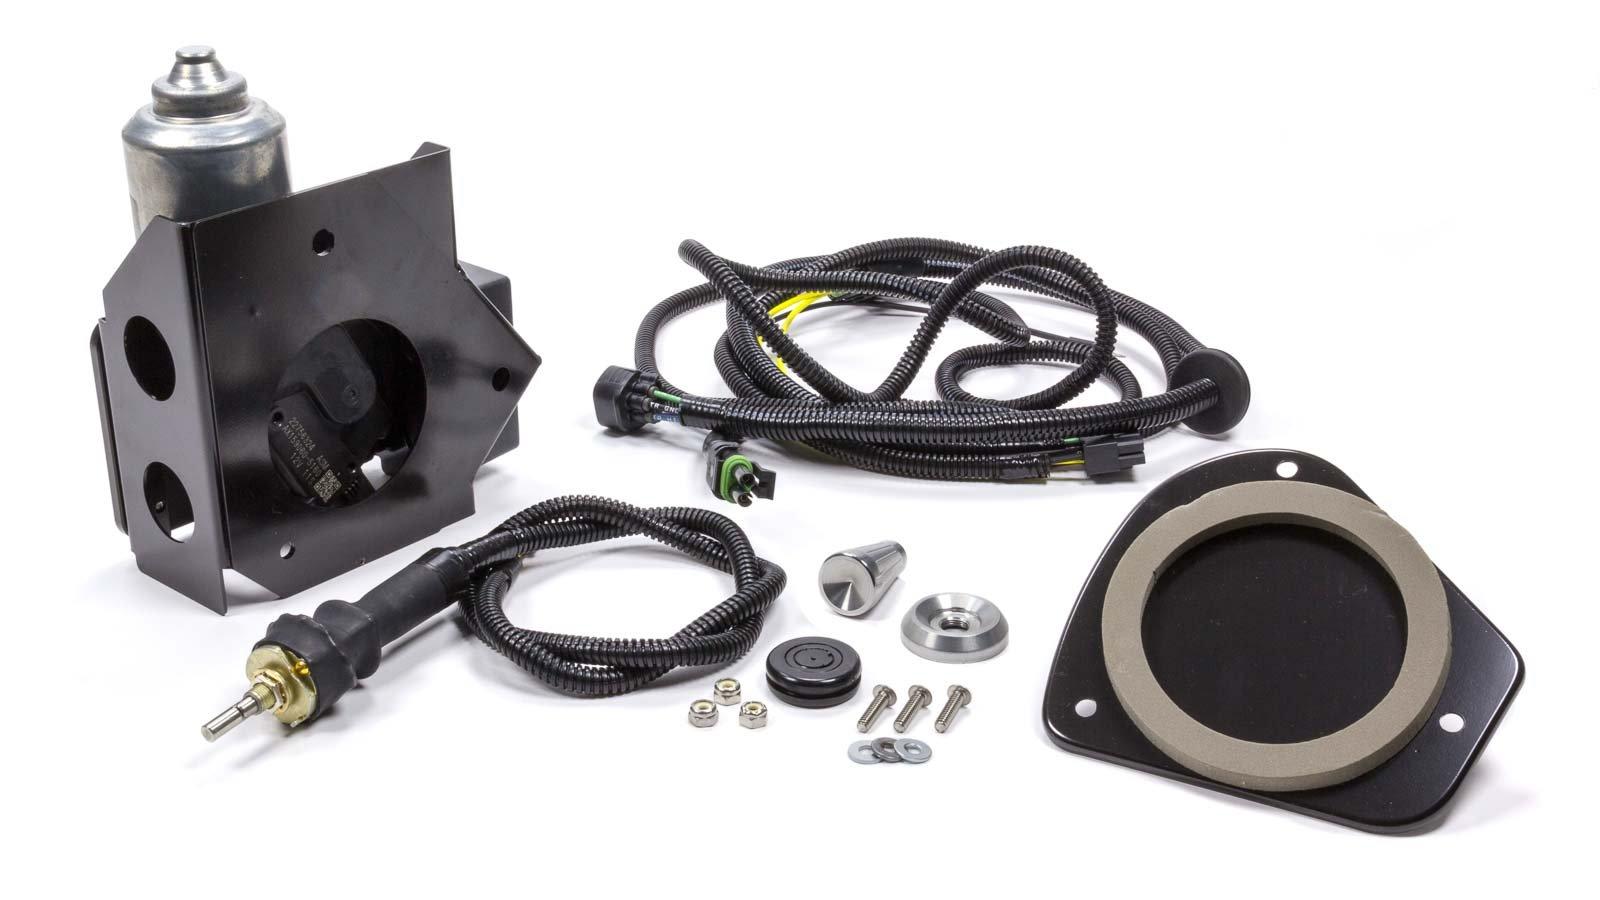 Detroit Speed 121614 Selecta-Speed Wiper Kit